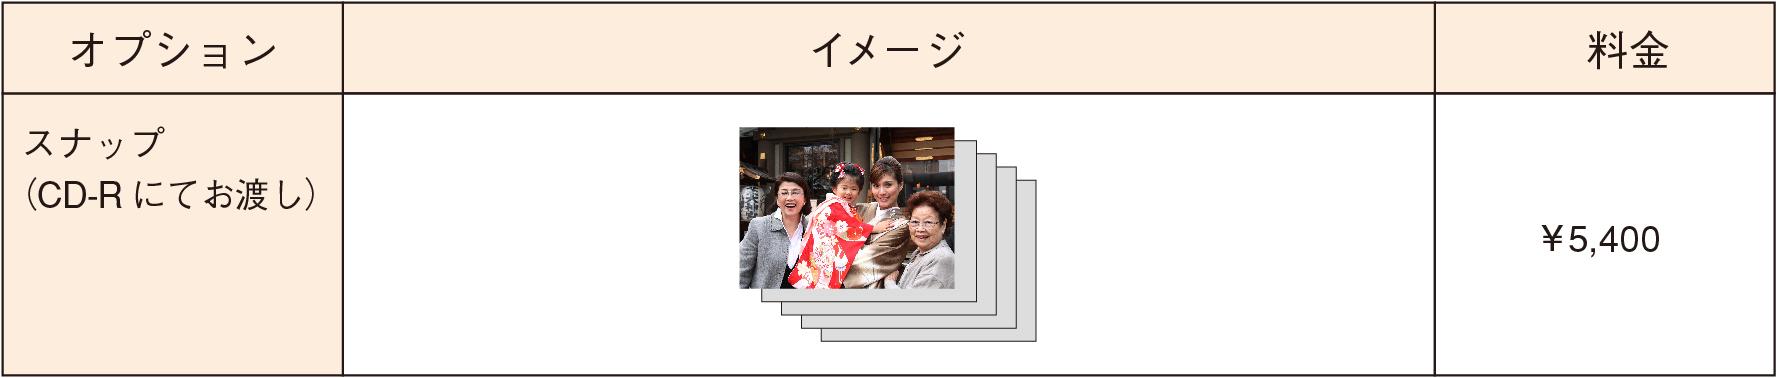 http://www.st-mg.co.jp/option_price.jpg